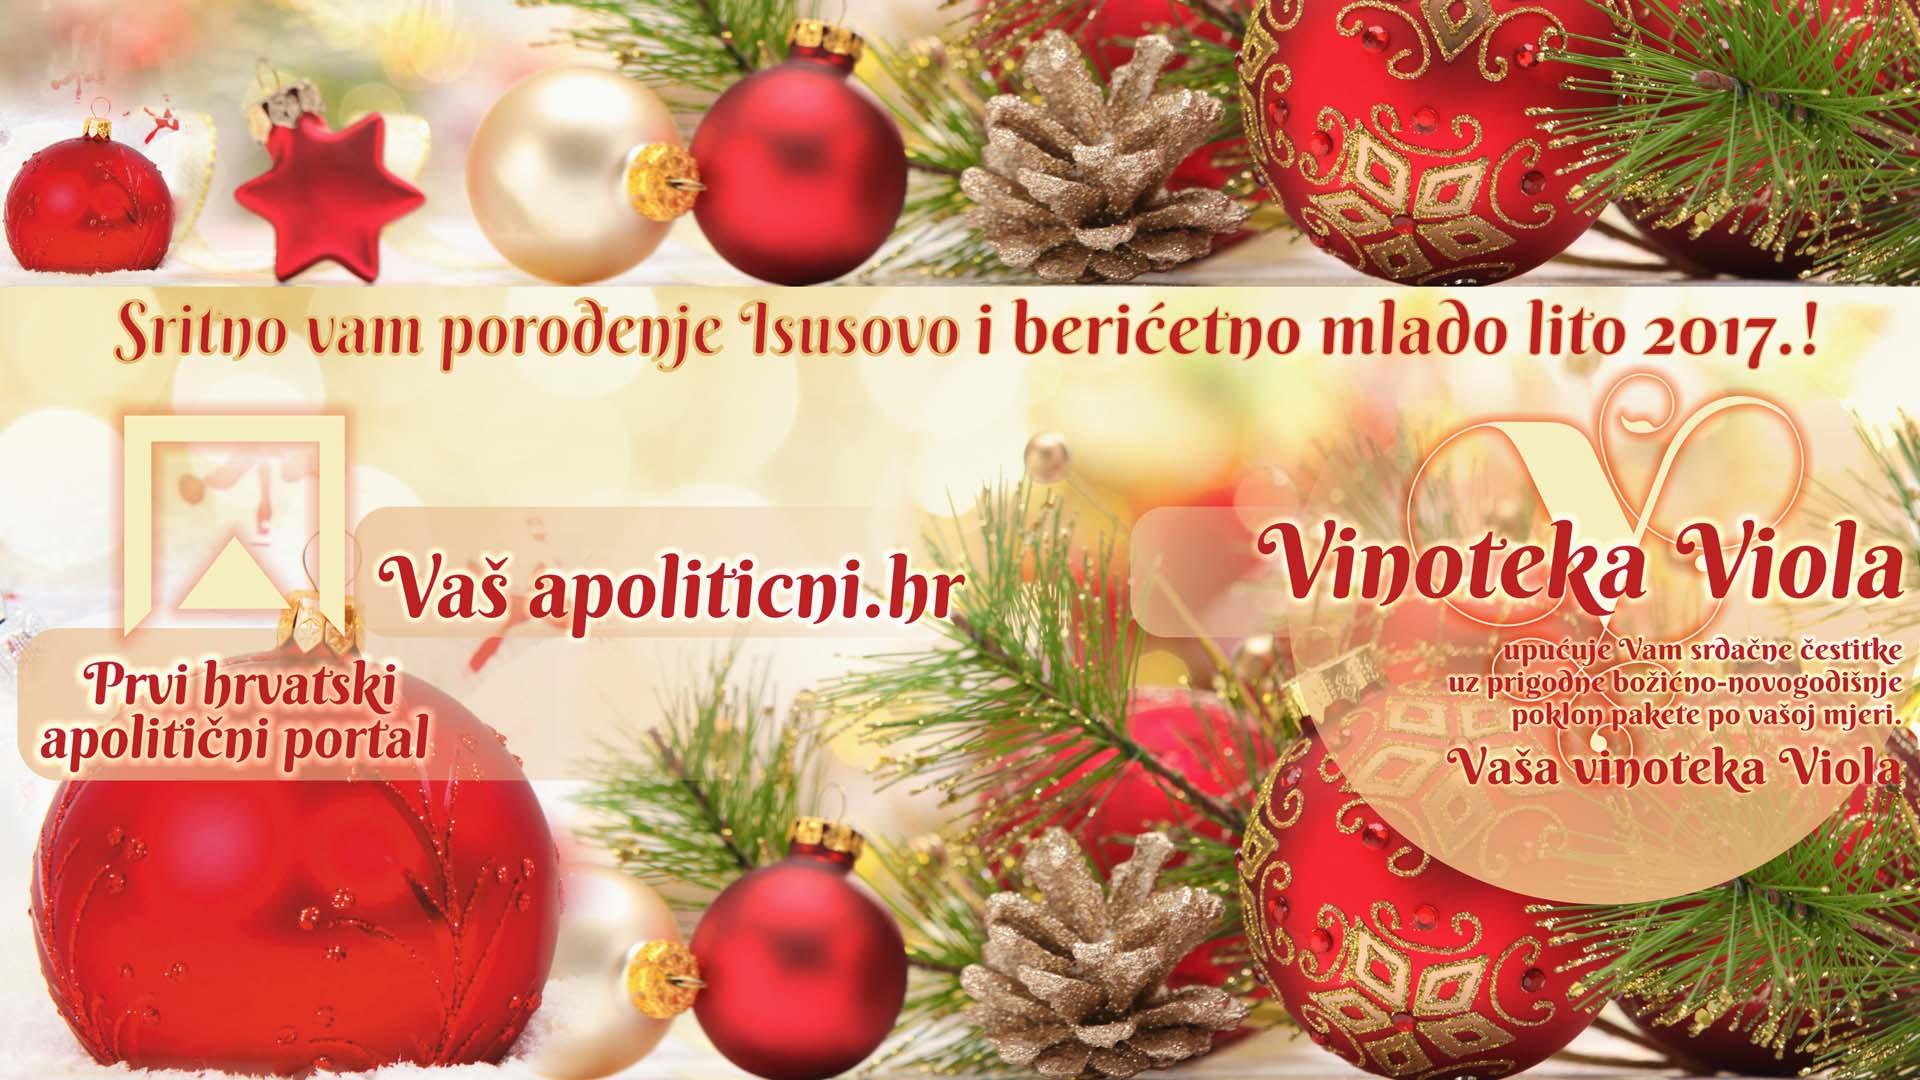 Čestit vam Božić i sretna Nova Godina 2017.!